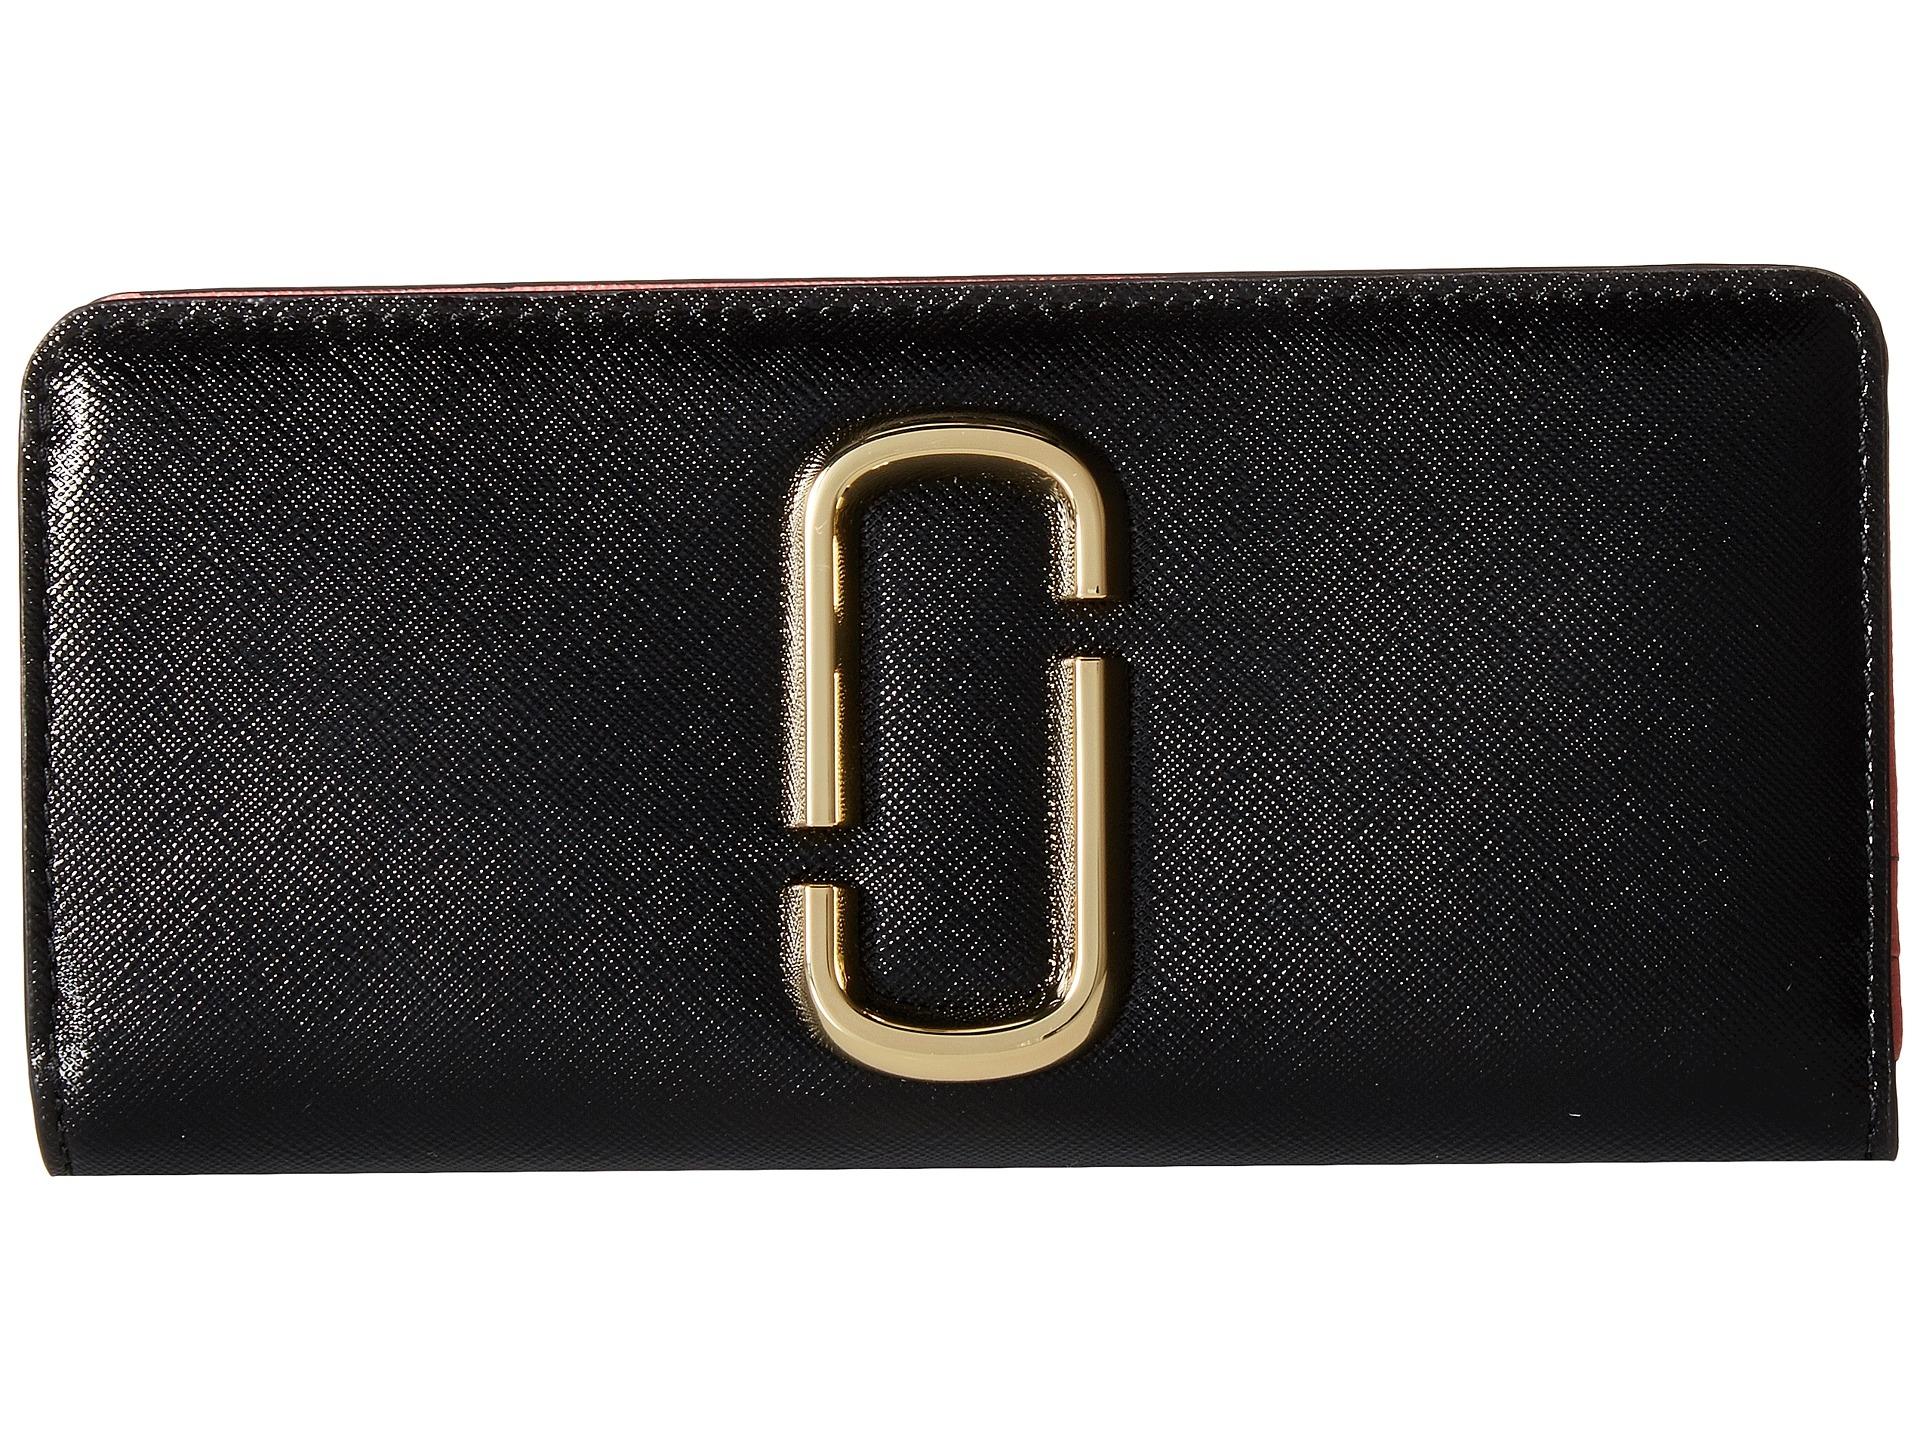 lägre pris med olika stilar modestilar Marc Jacobs plånböcker - Marc Jacobs plånbok MMJ-W41679